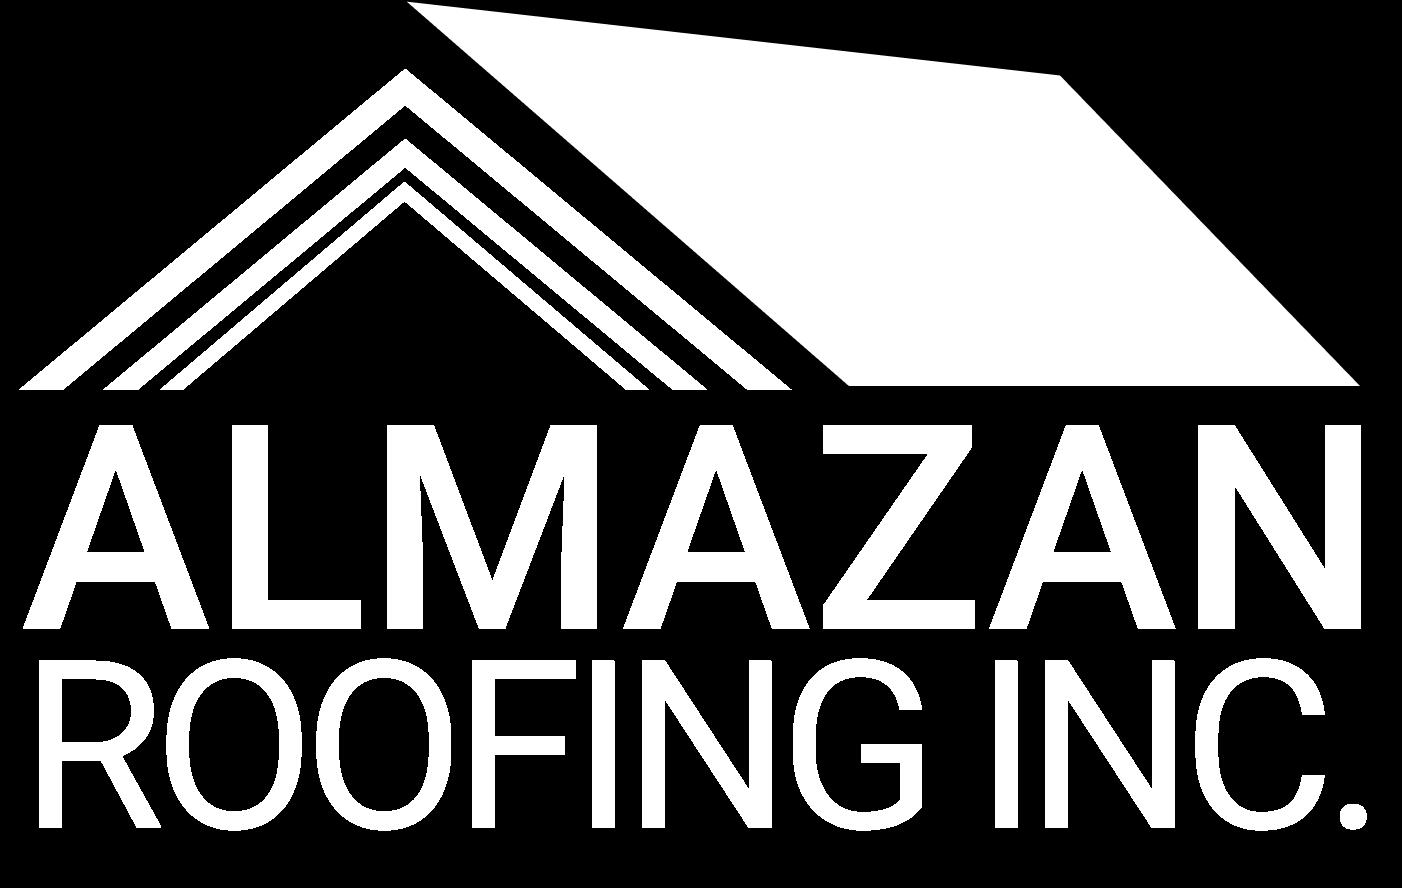 almazan roofing logo